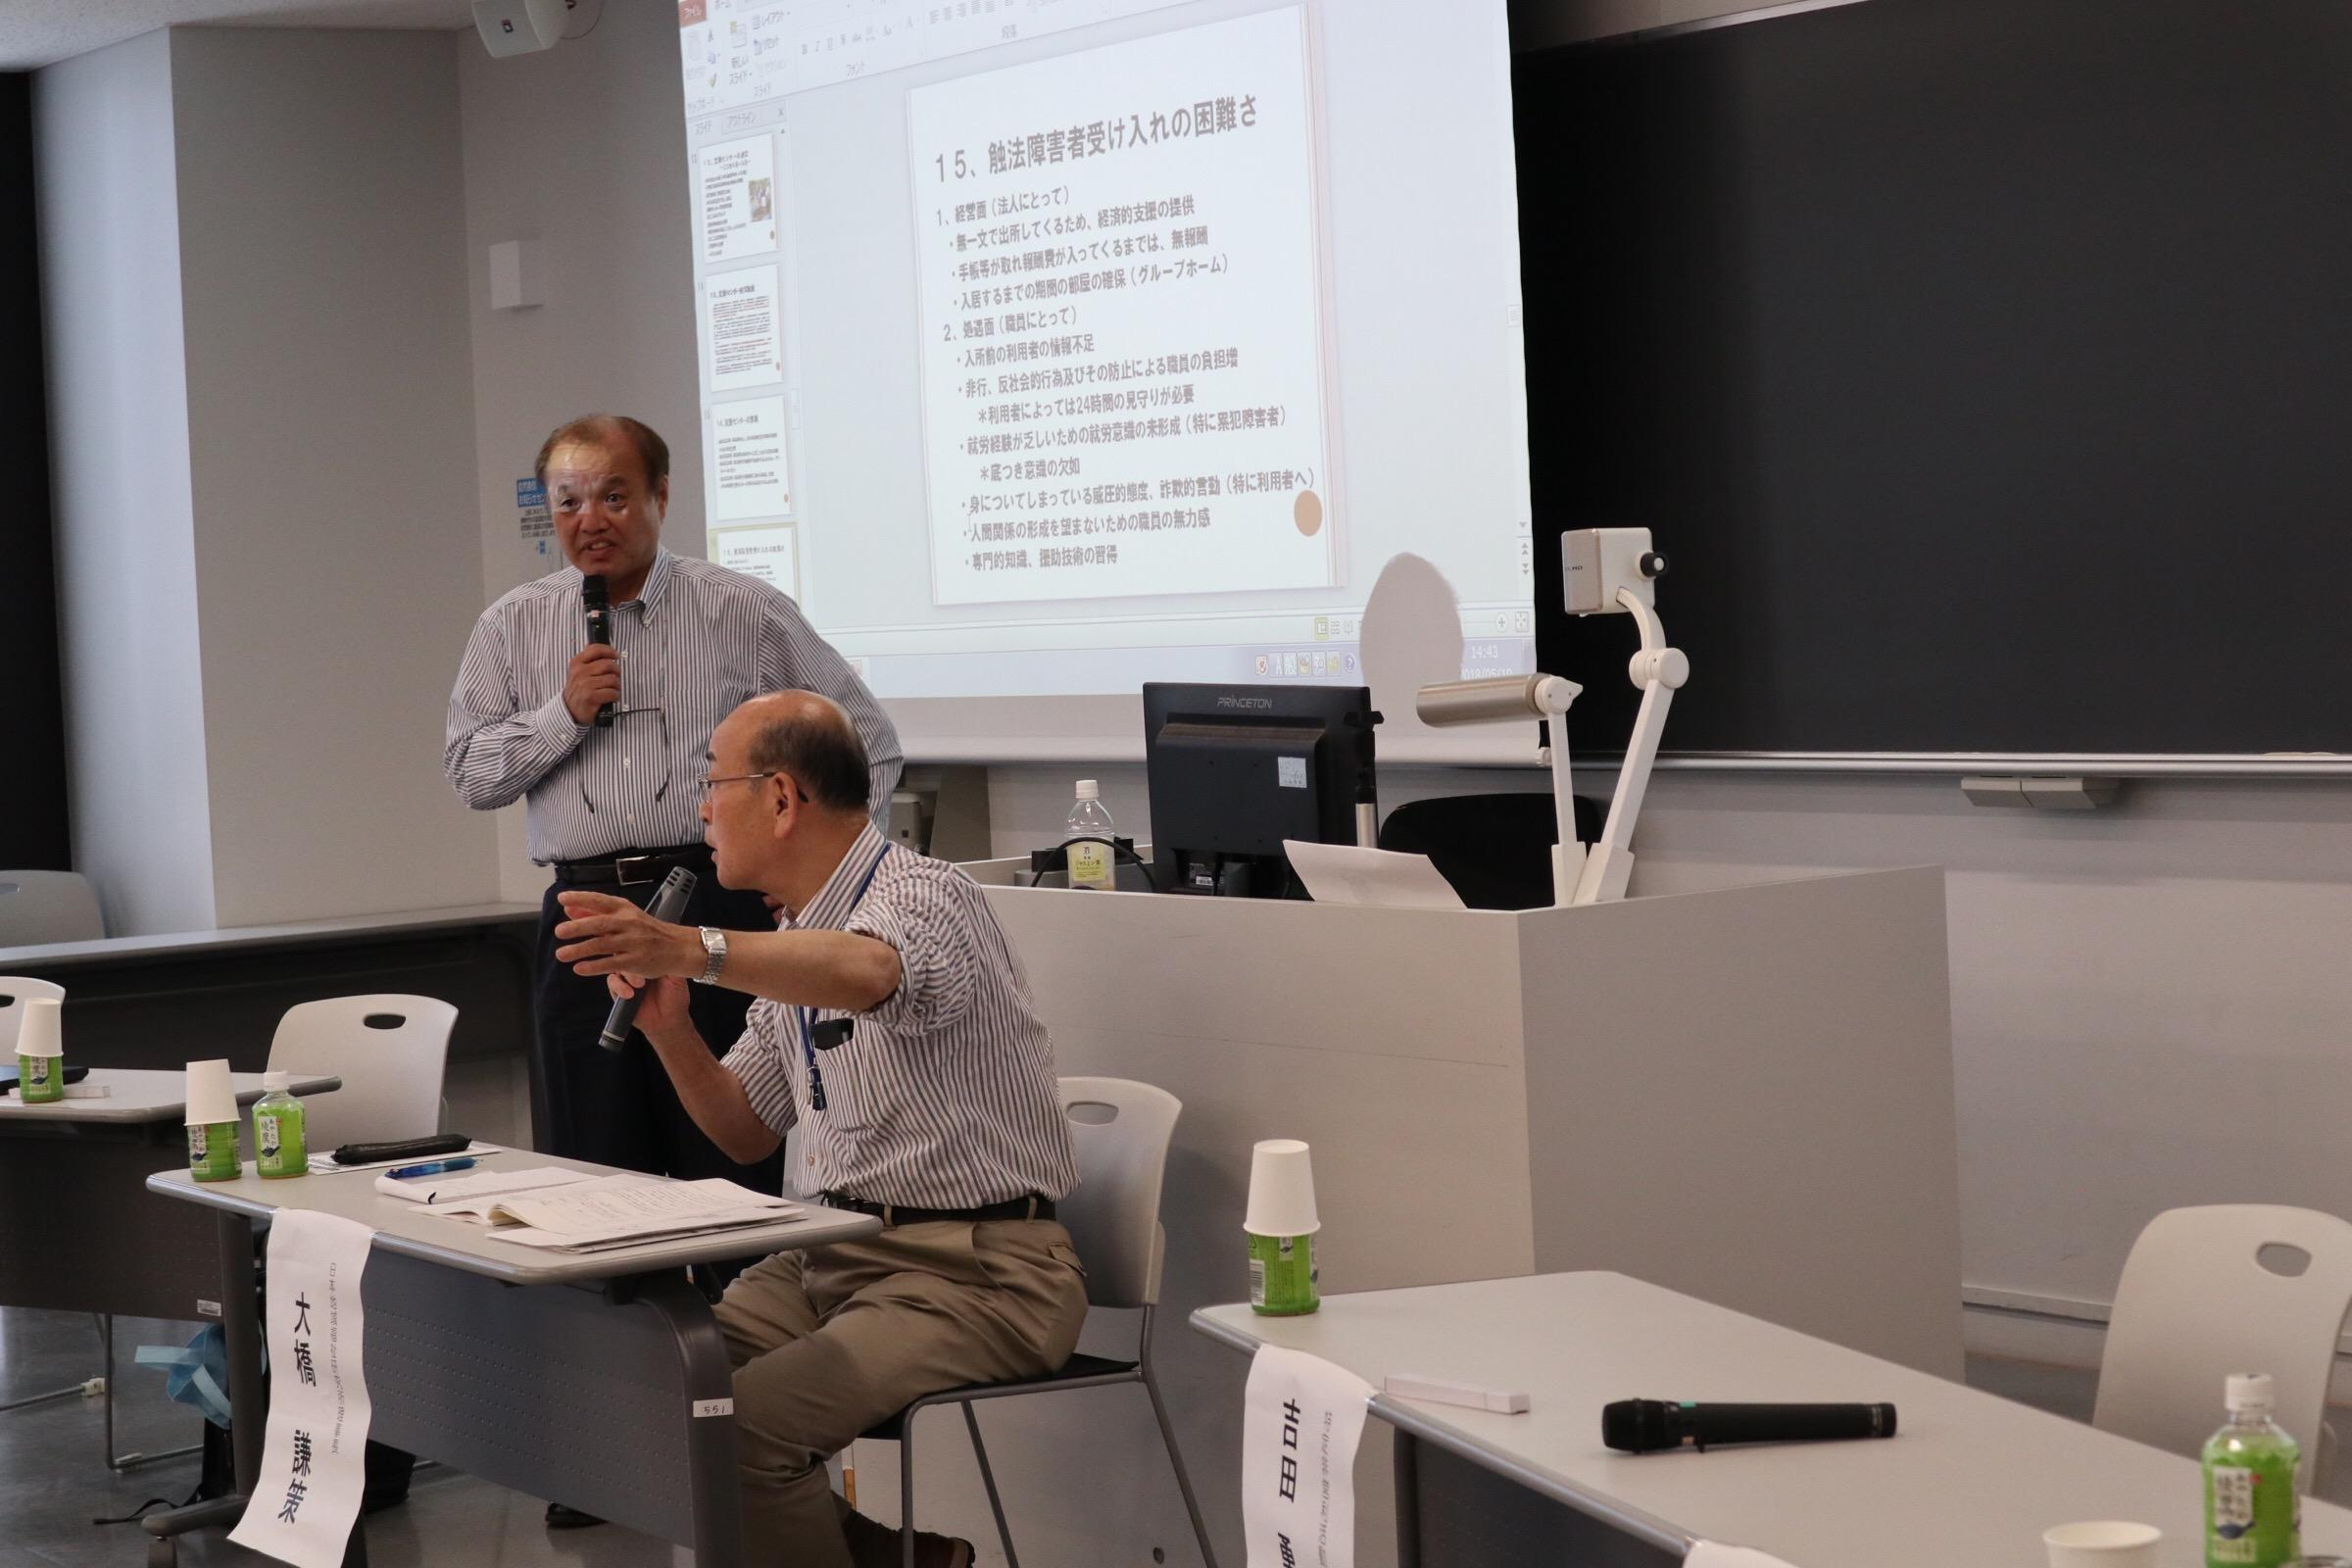 http://www.jicw.jp/csw/seminar02/file/IMG_2097.jpg